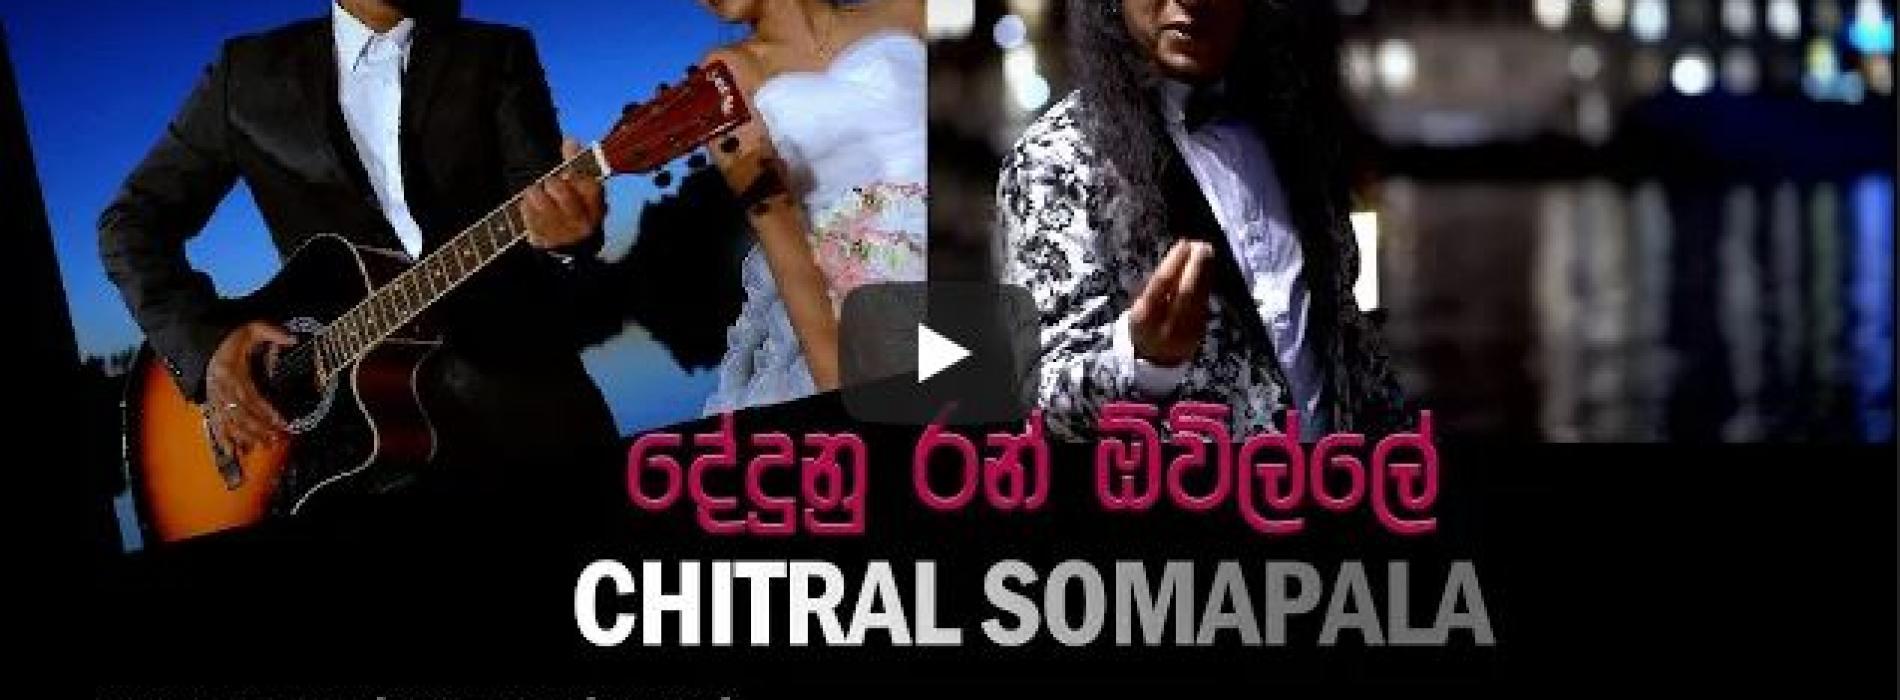 New Music : Dedunu Ran Oville (දෙදුනු රන් ඔවිල්ලේ) – Chitral Somapala